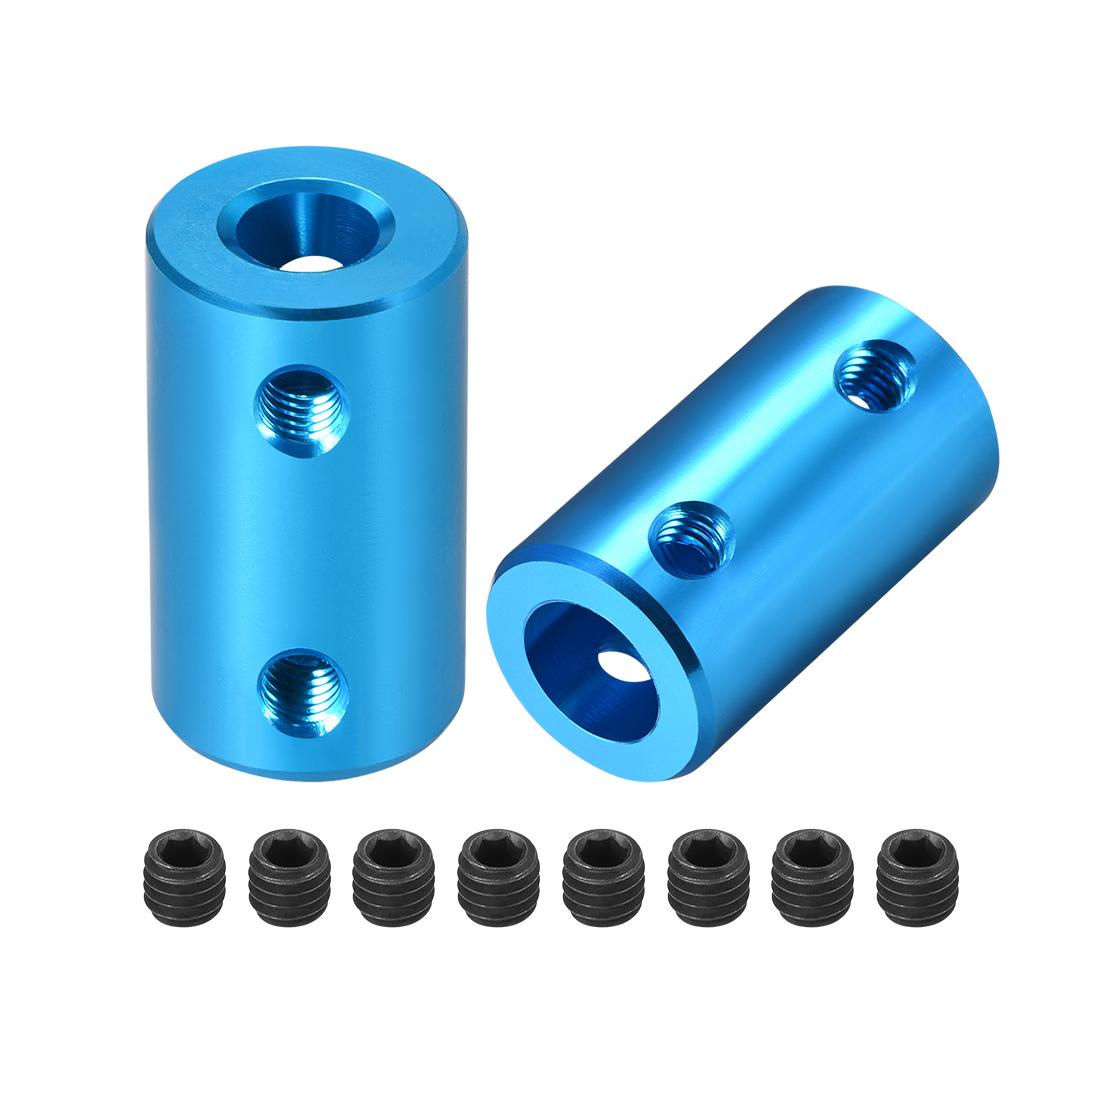 Shaft Coupling 6mm to 8mm L25xD14 Robot Motor Wheel Rigid Coupler Blue 2 Pcs